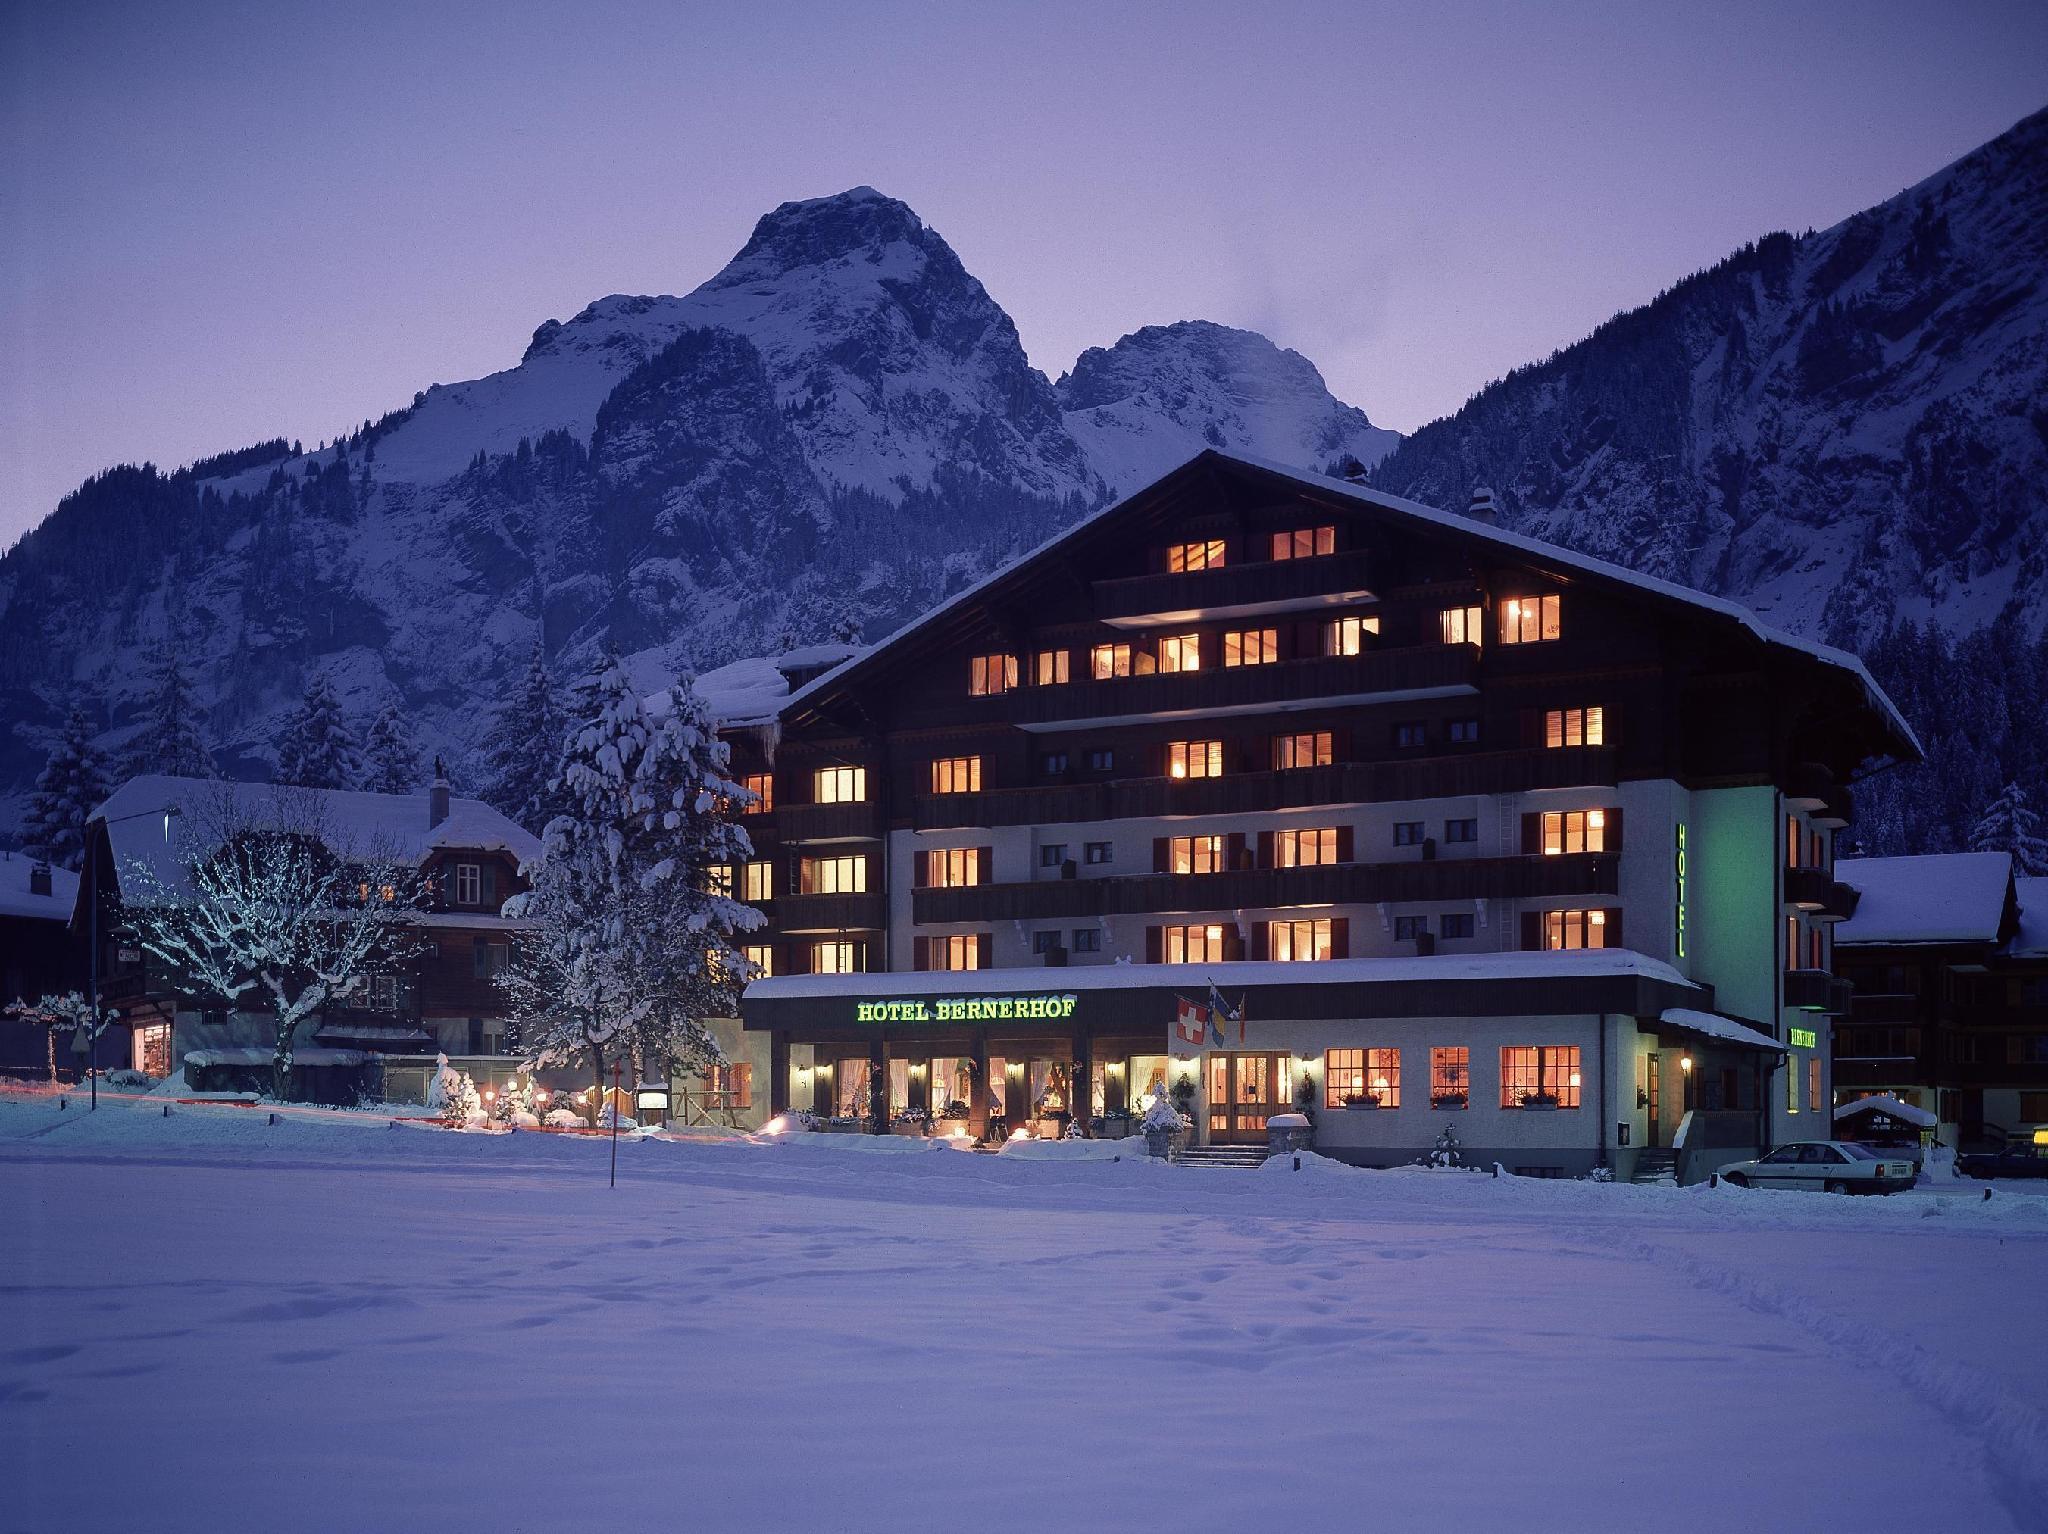 Hotel Restaurant Bernerhof Kandersteg